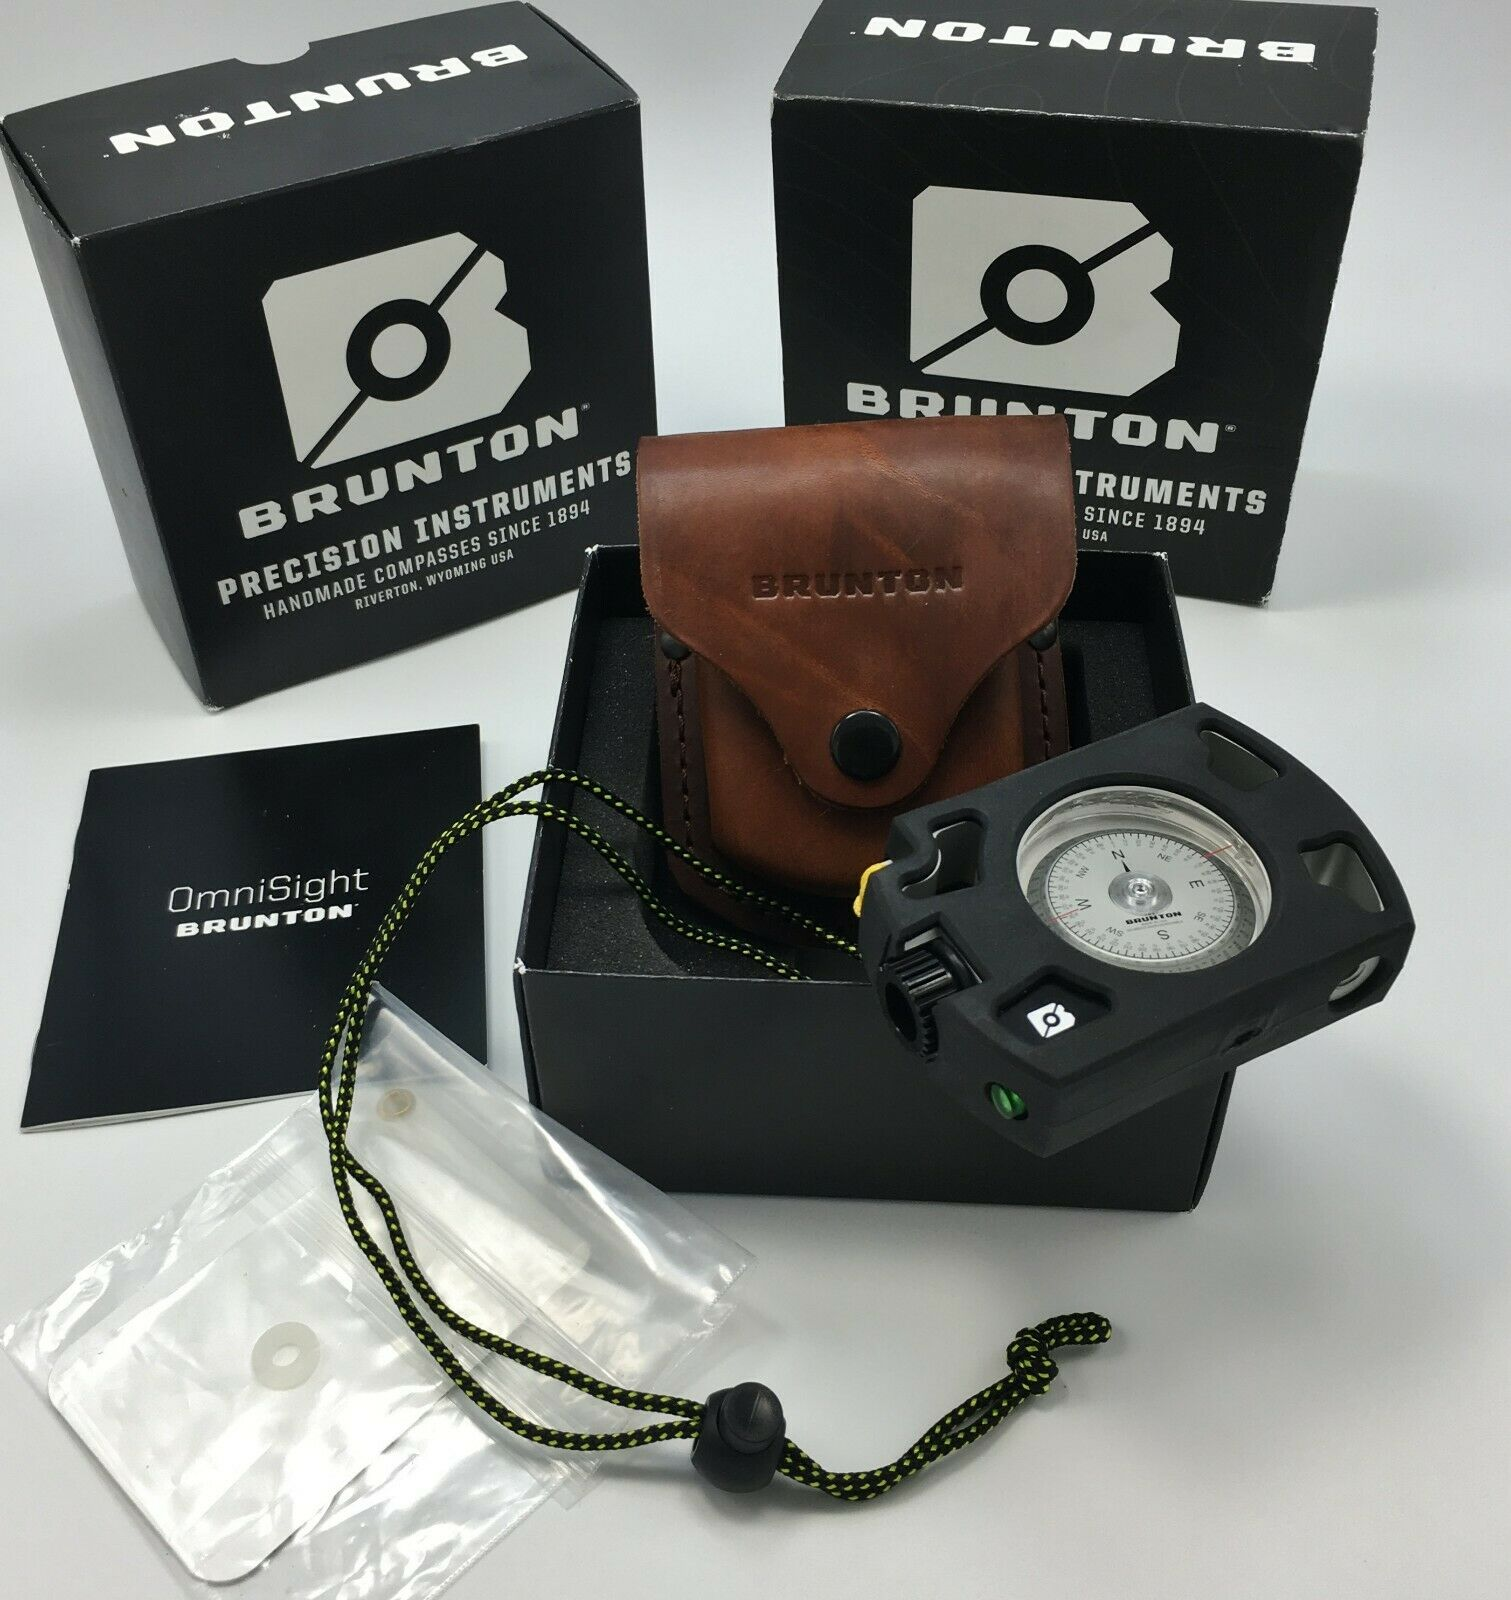 Brunton ® Omni-vista avistamiento Iluminado LED Brújula + Cochecasa De Aluminio & Vaina